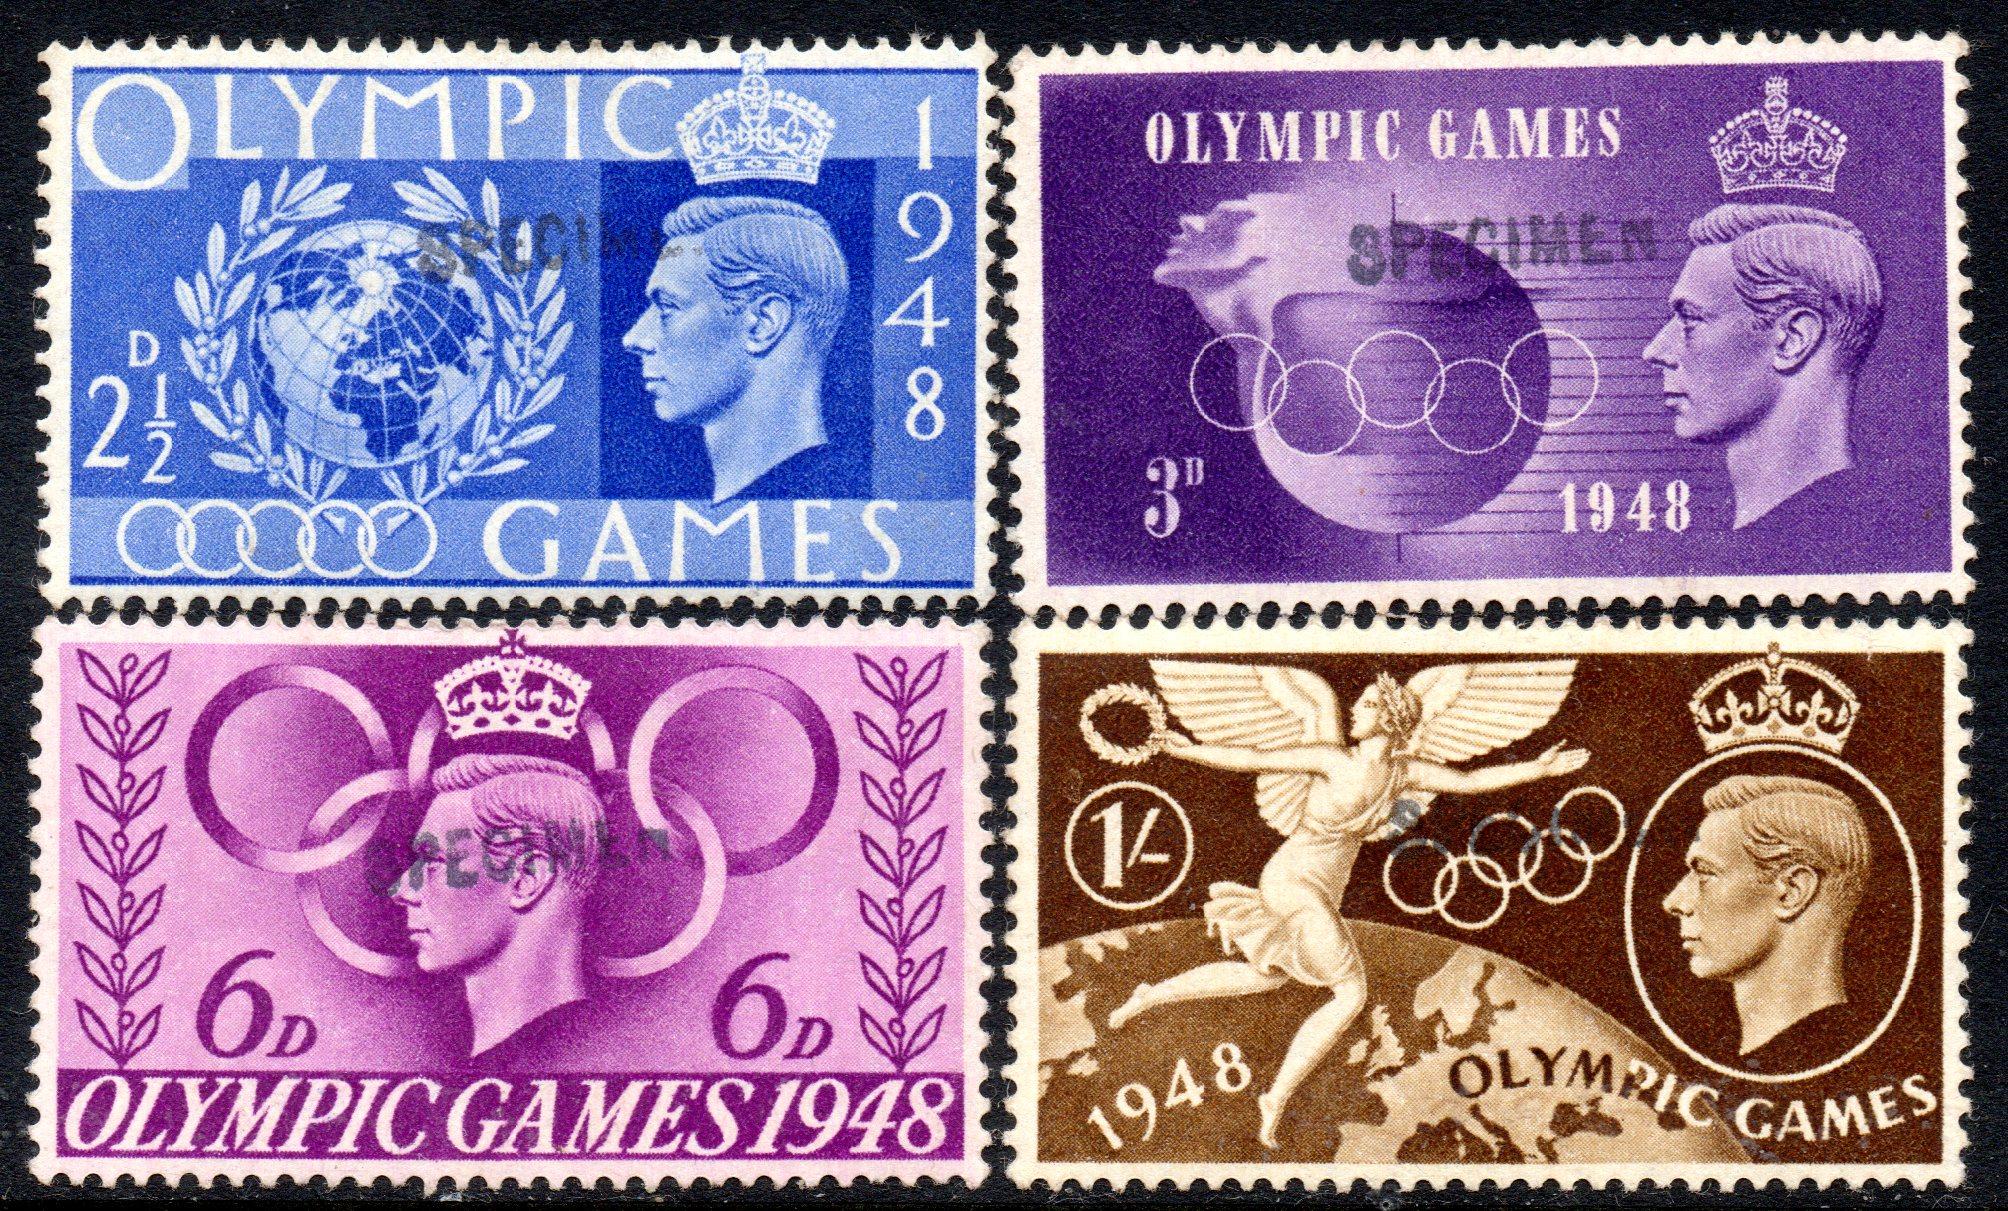 1948 OLYMPIC GAMES SPECIMEN SET